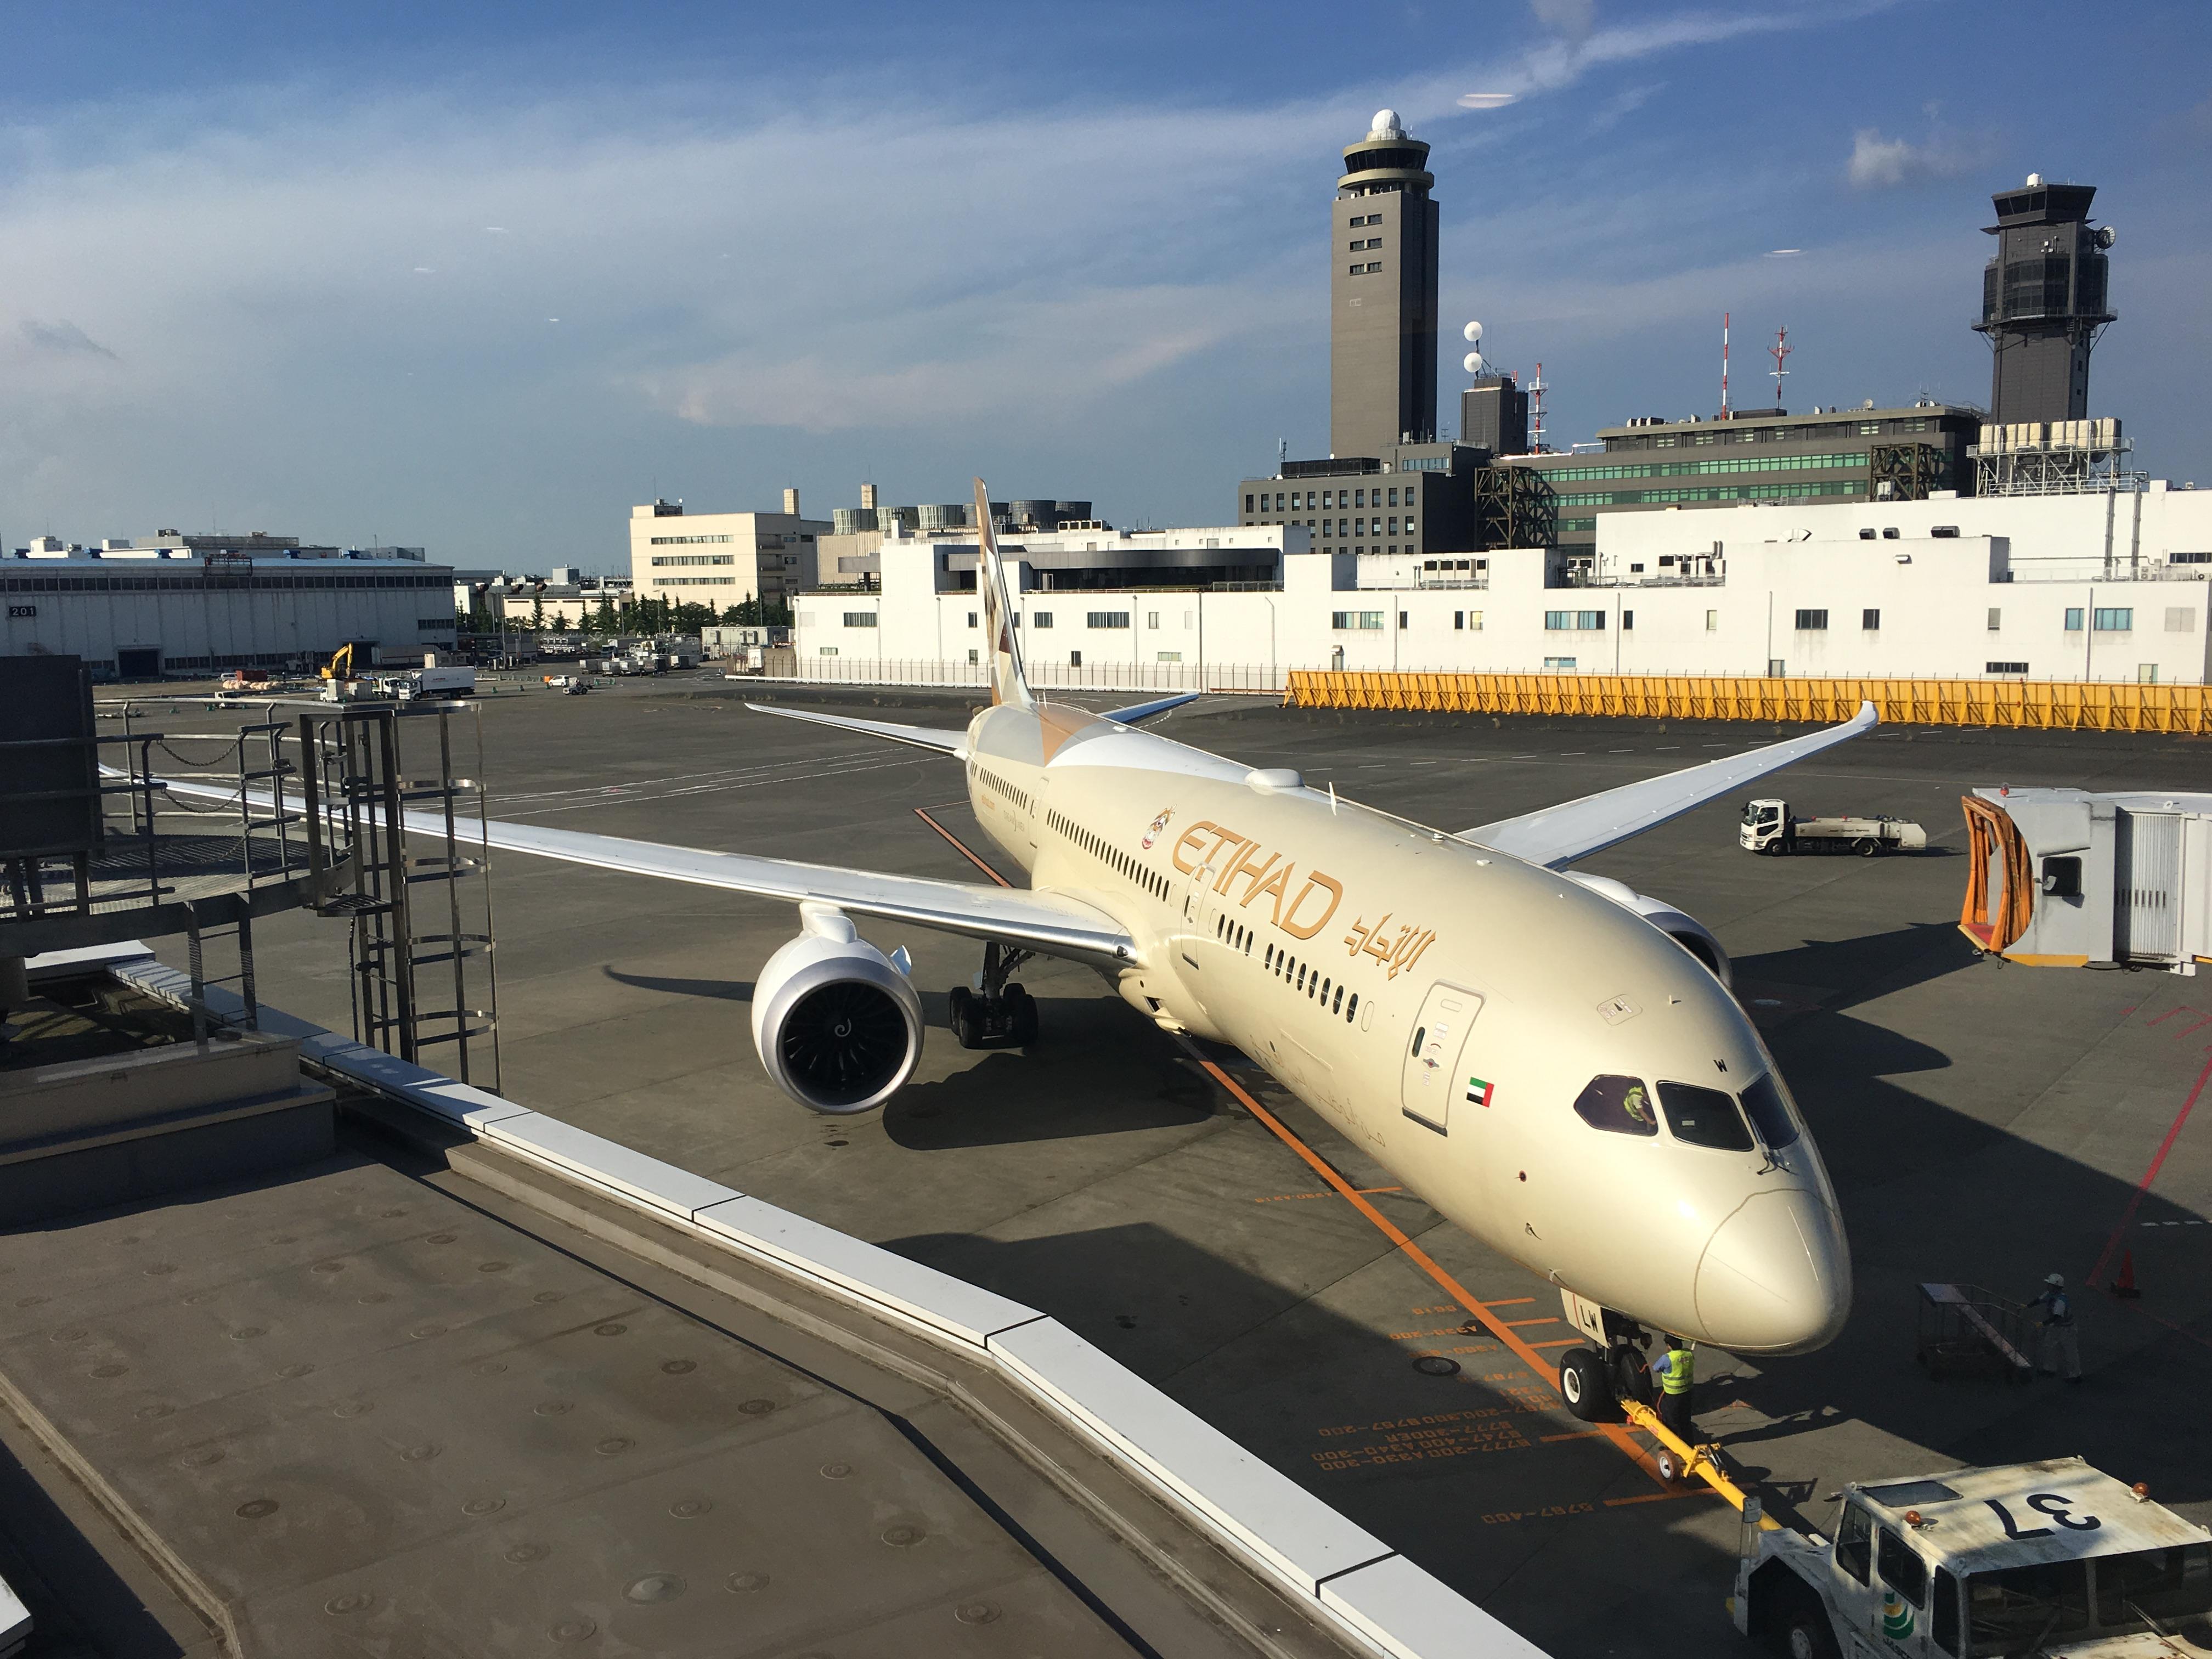 Business Class Review : エティハド航空(EY) EY871 成田(NRT) – アブダビ(AUH) ボーイング B787-9 ドリームライナー